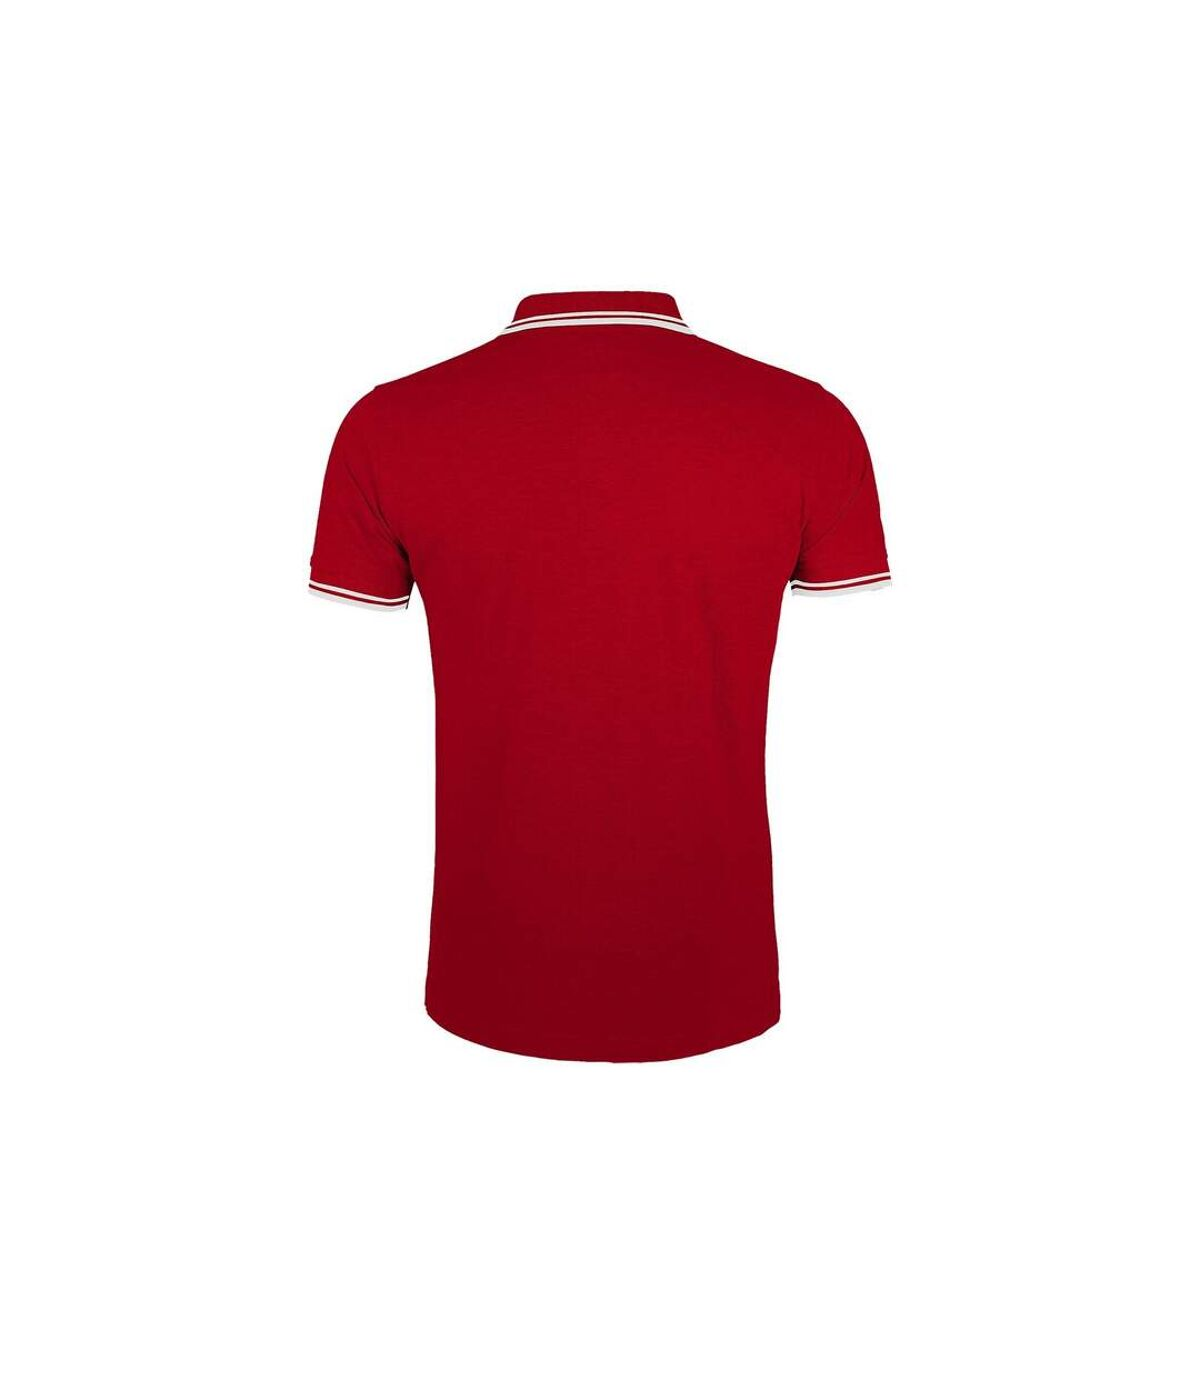 SOLS Mens Pasadena Tipped Short Sleeve Pique Polo Shirt (Red/White) - UTPC2431